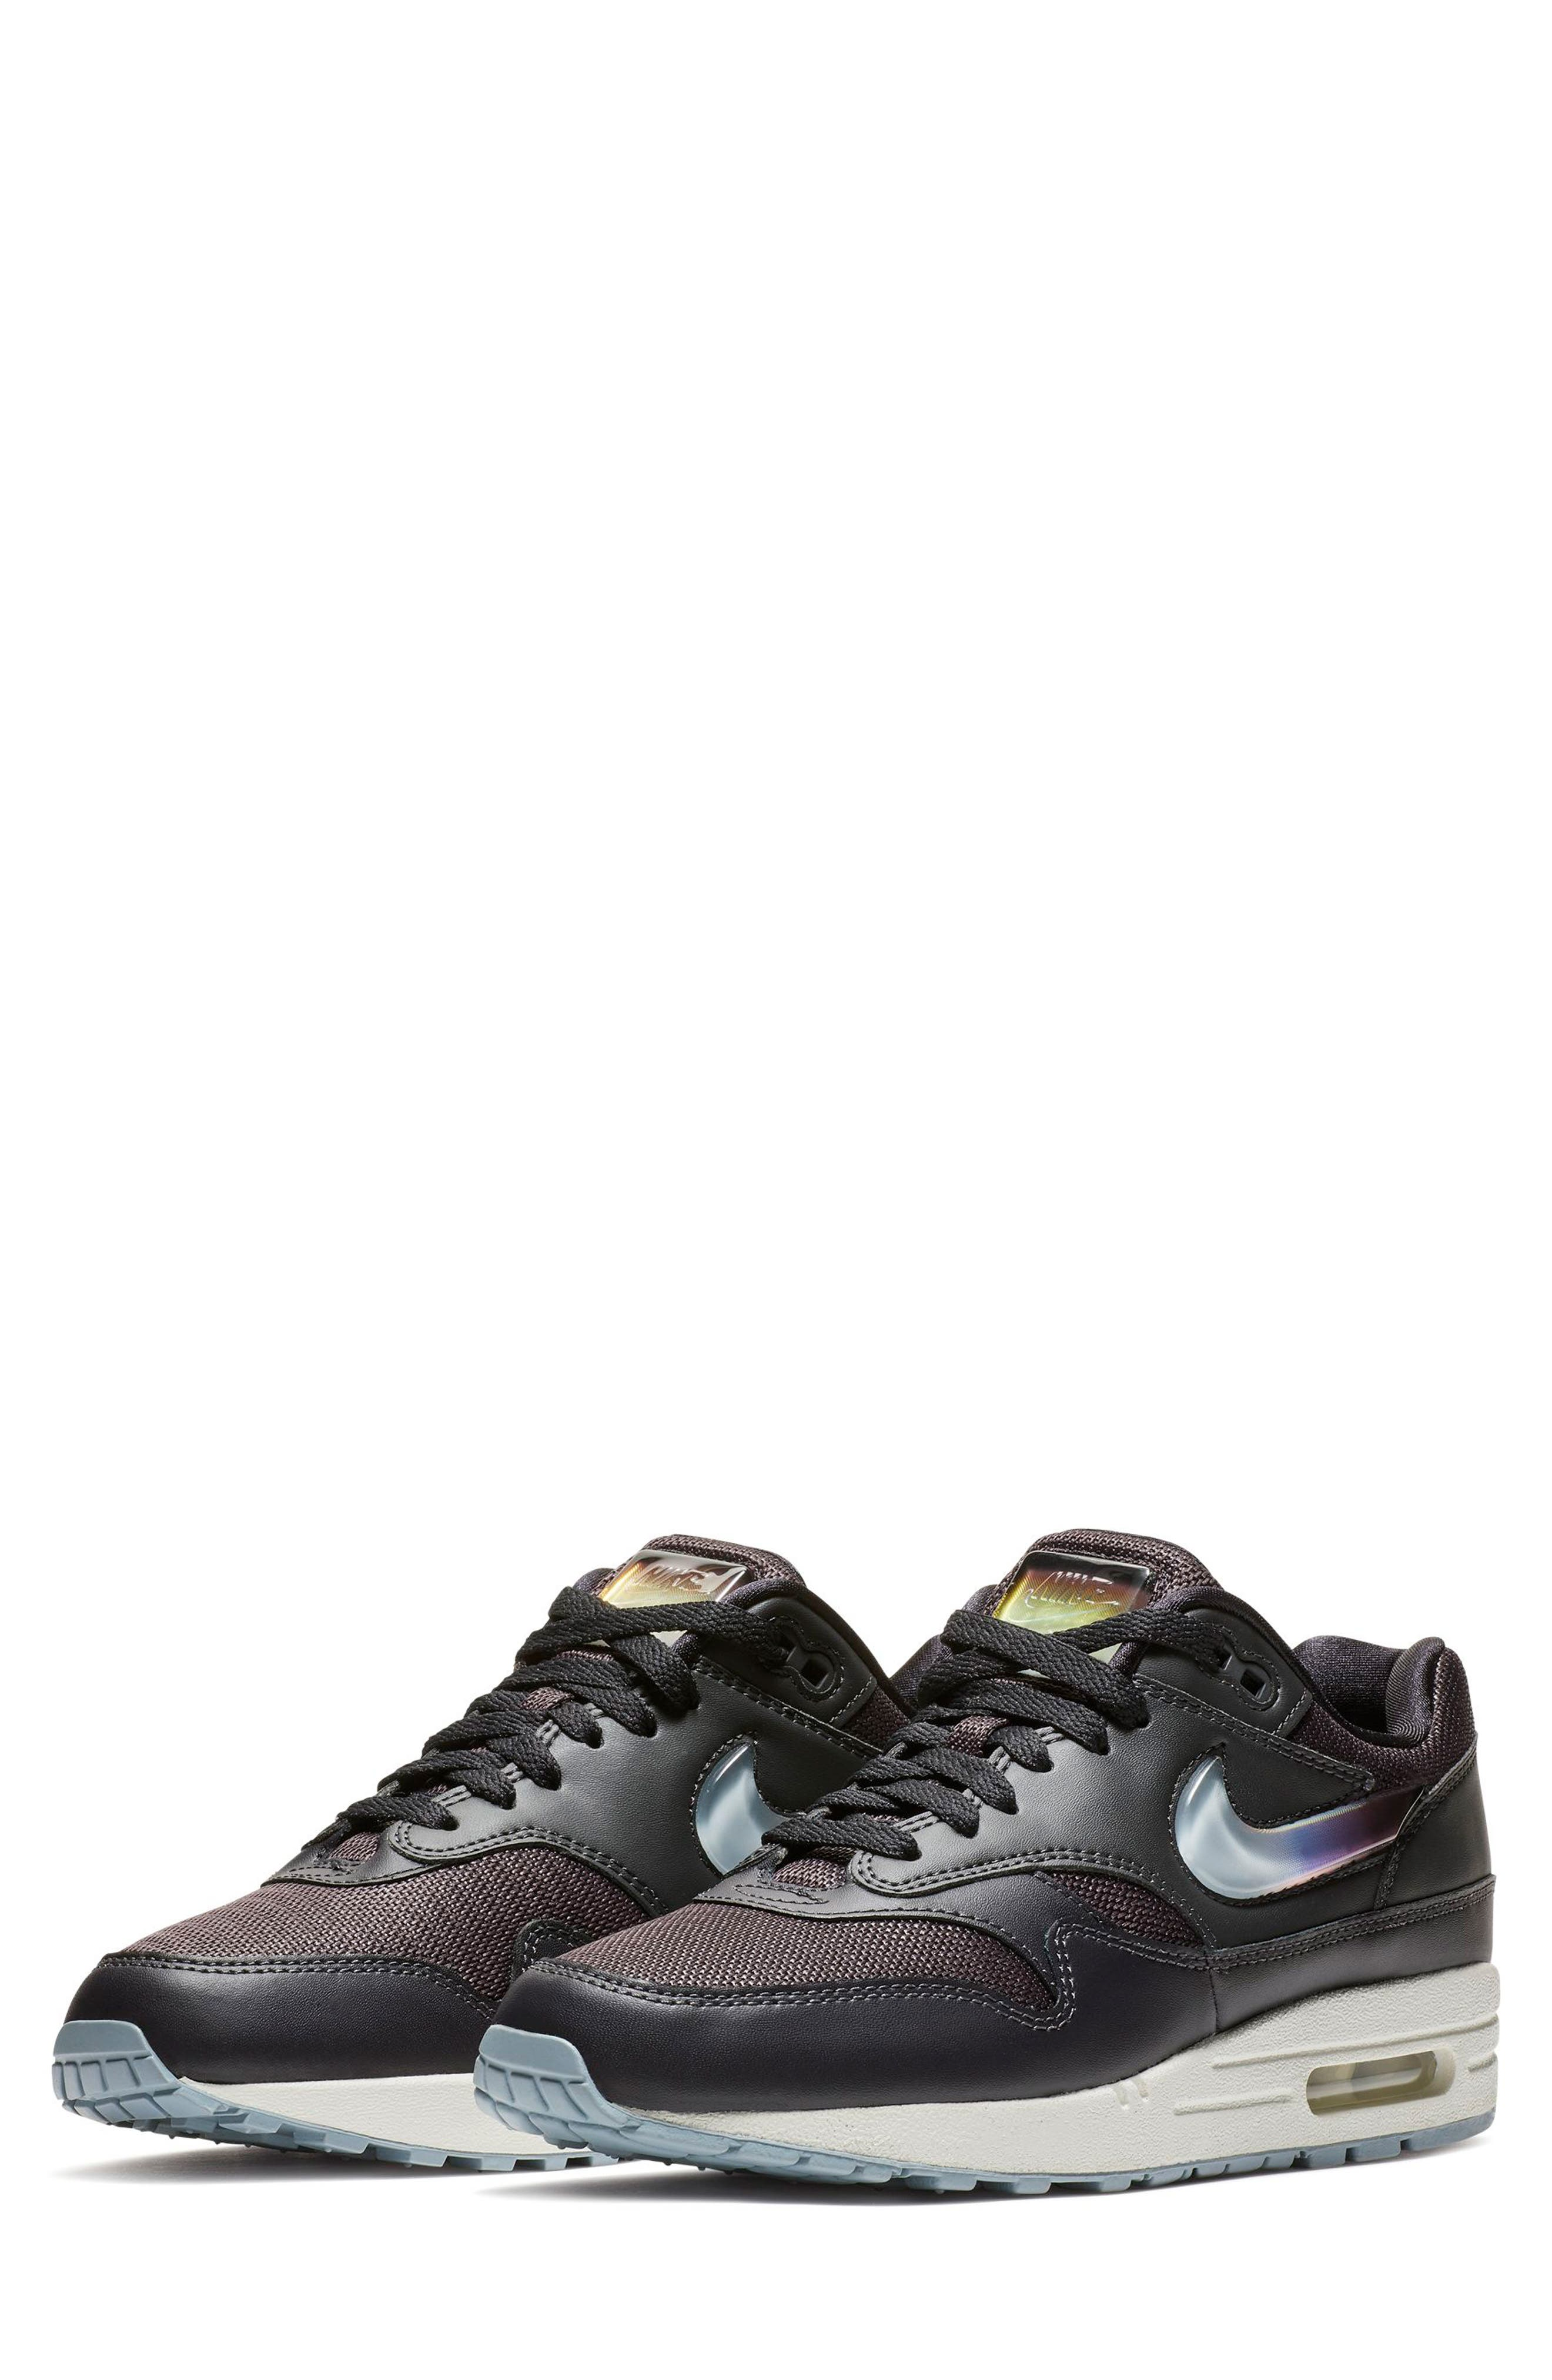 NIKE, Air Max 1 JP Sneaker, Main thumbnail 1, color, OIL GREY/ OBSIDIAN/ WHITE